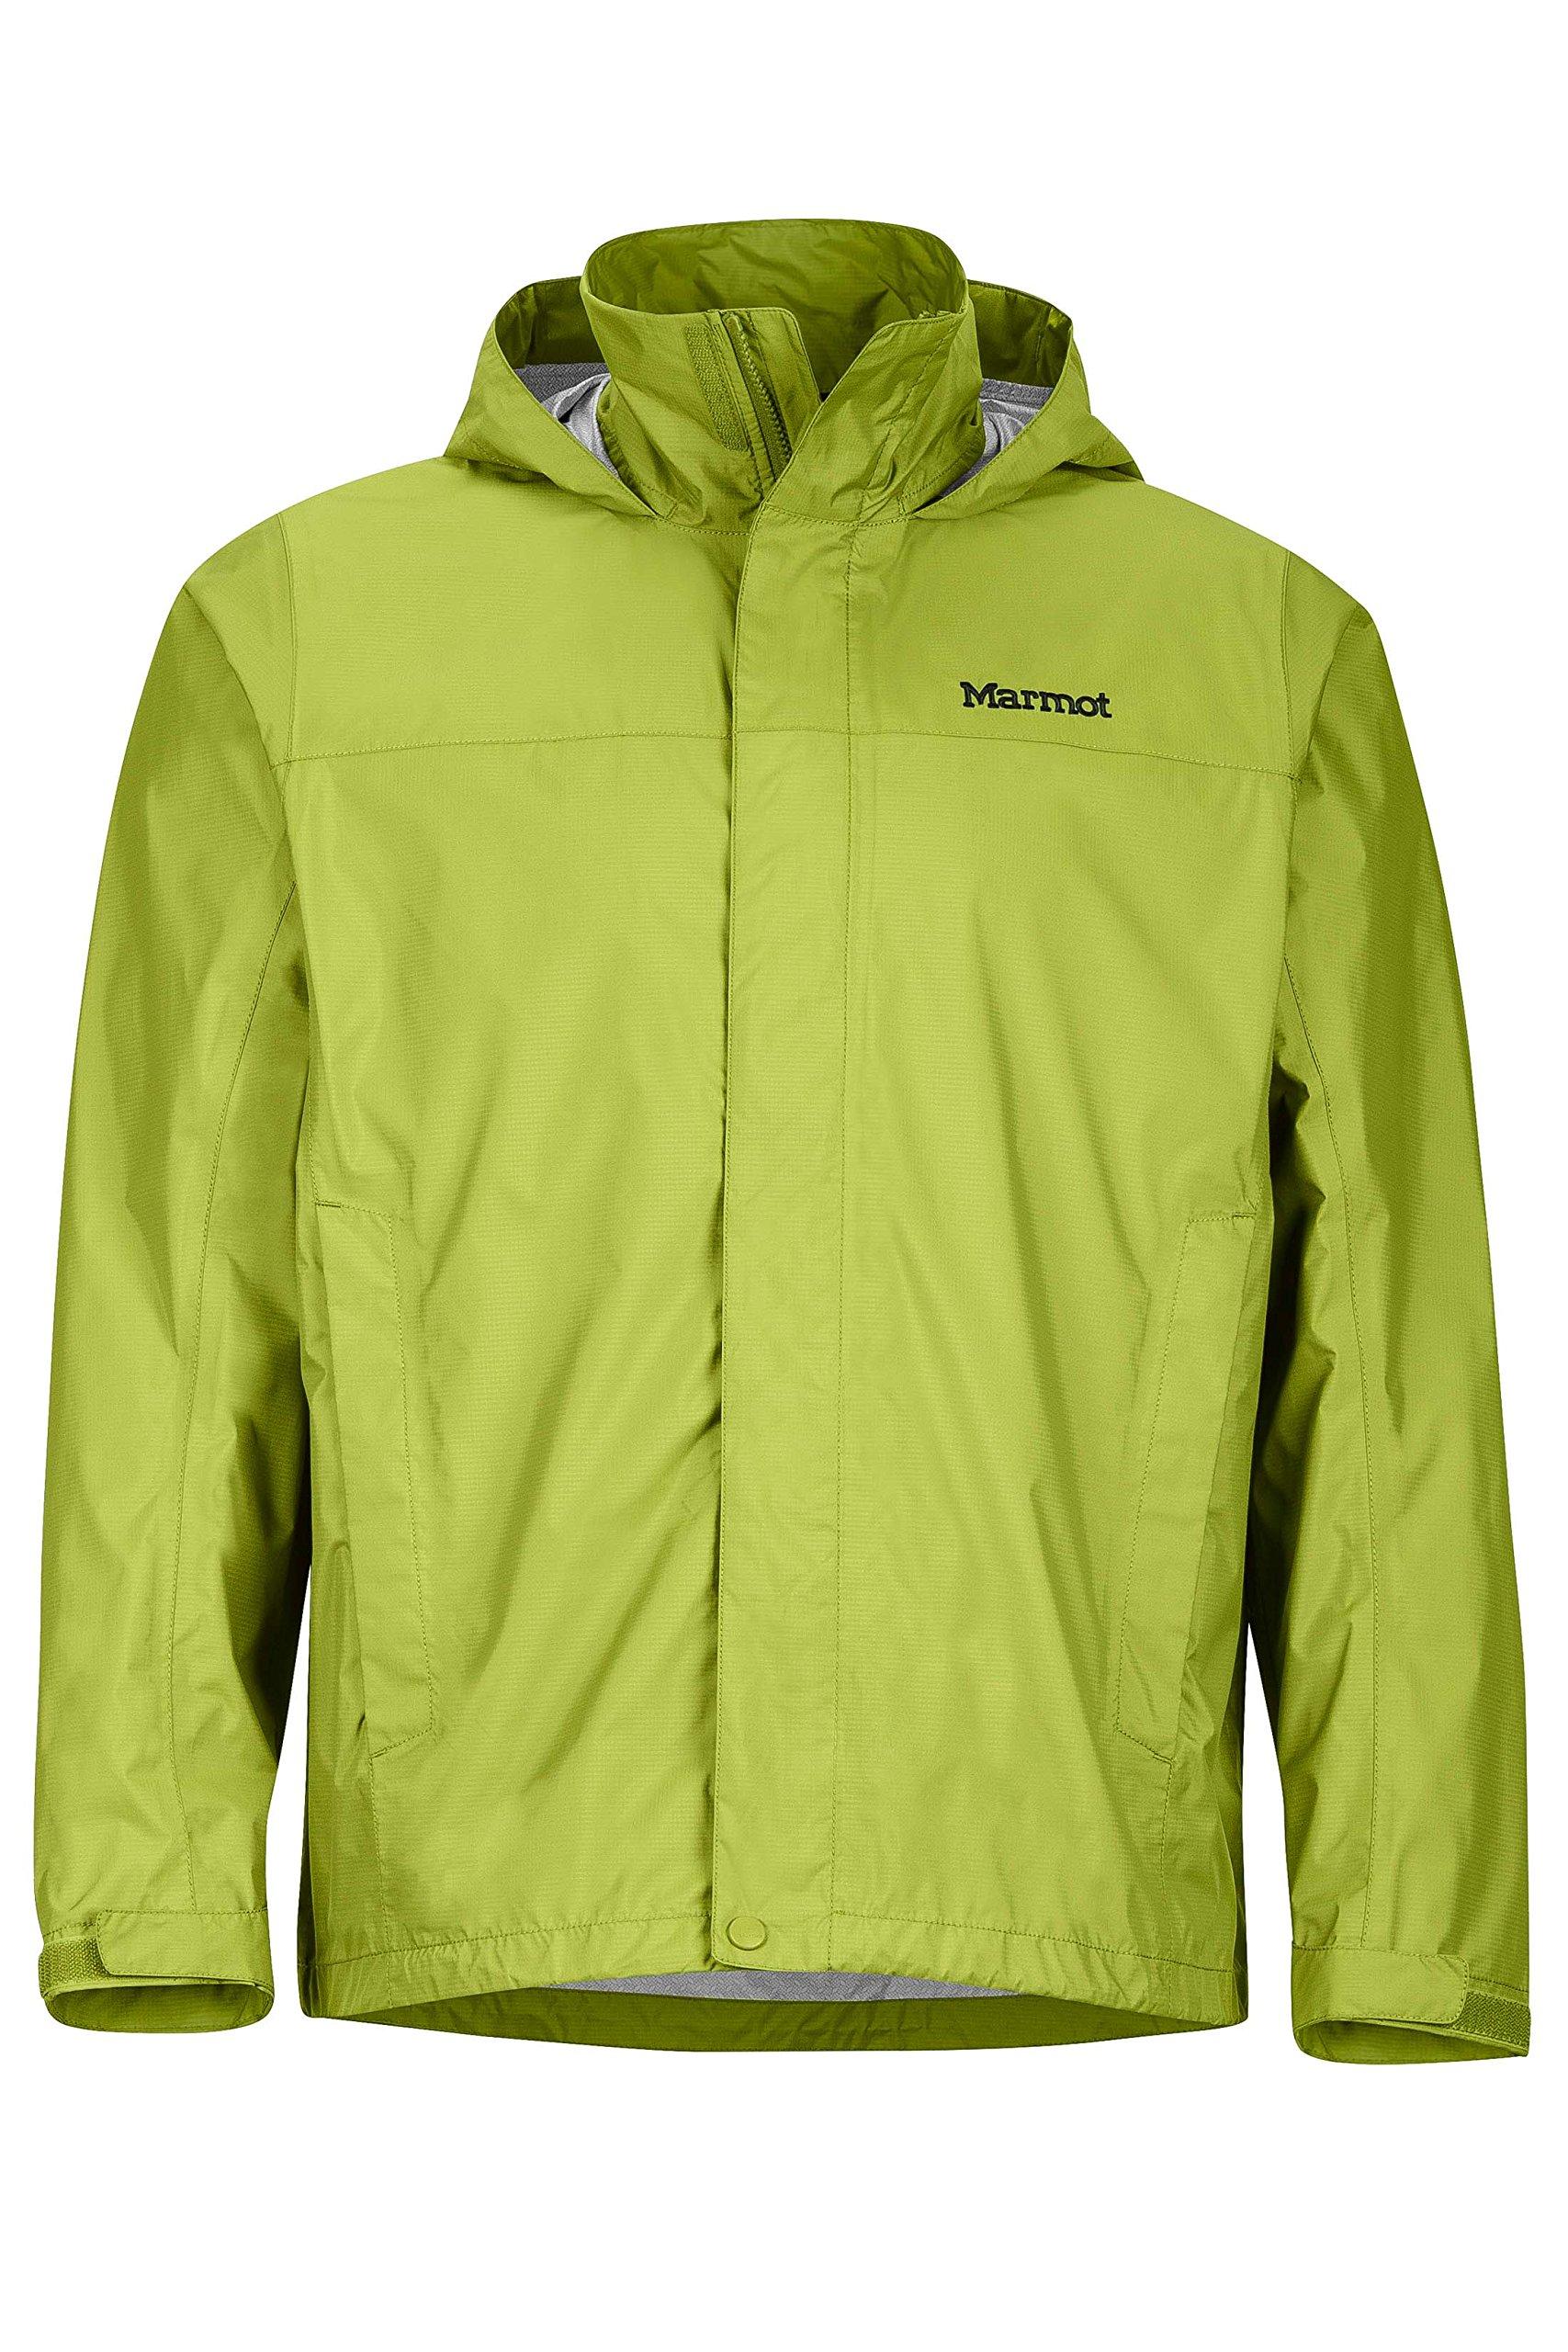 Marmot Men's PreCip Jacket, Green Lichen, M by Marmot